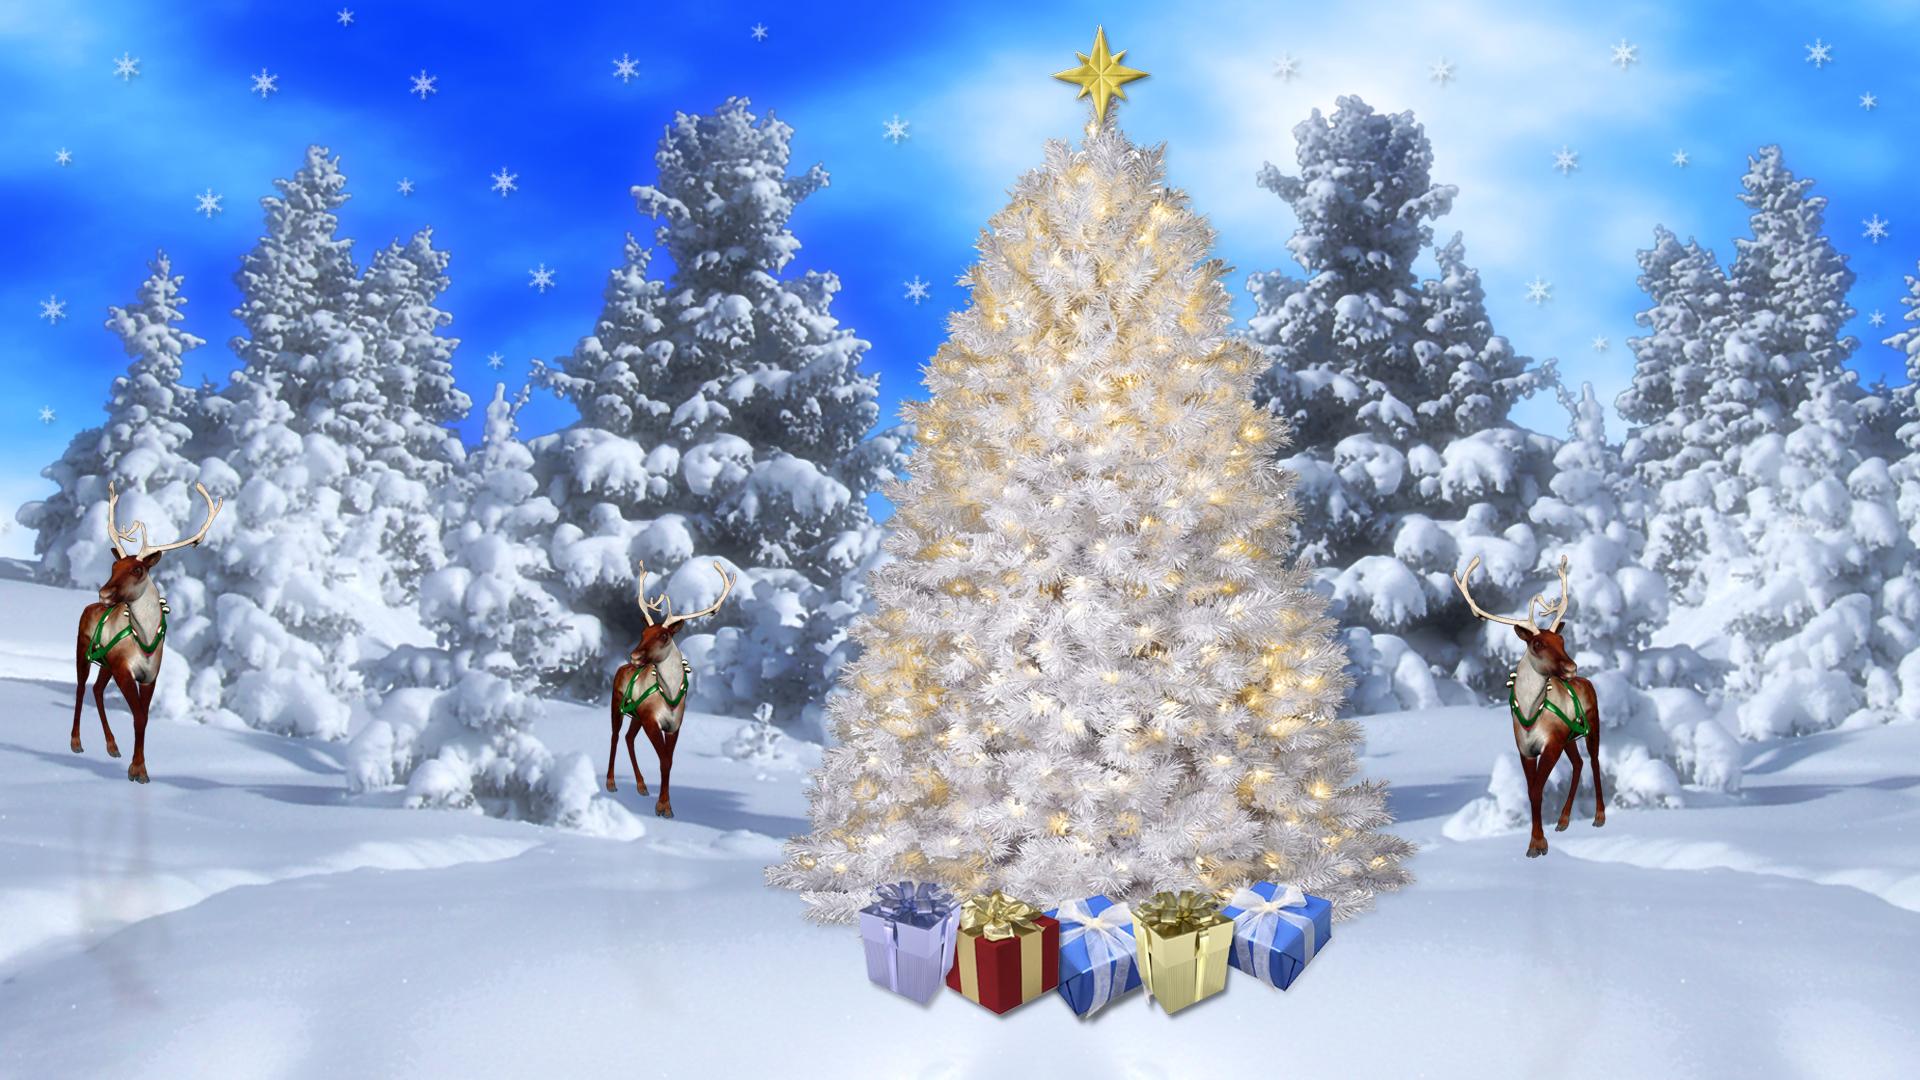 Wilderness Christmas White